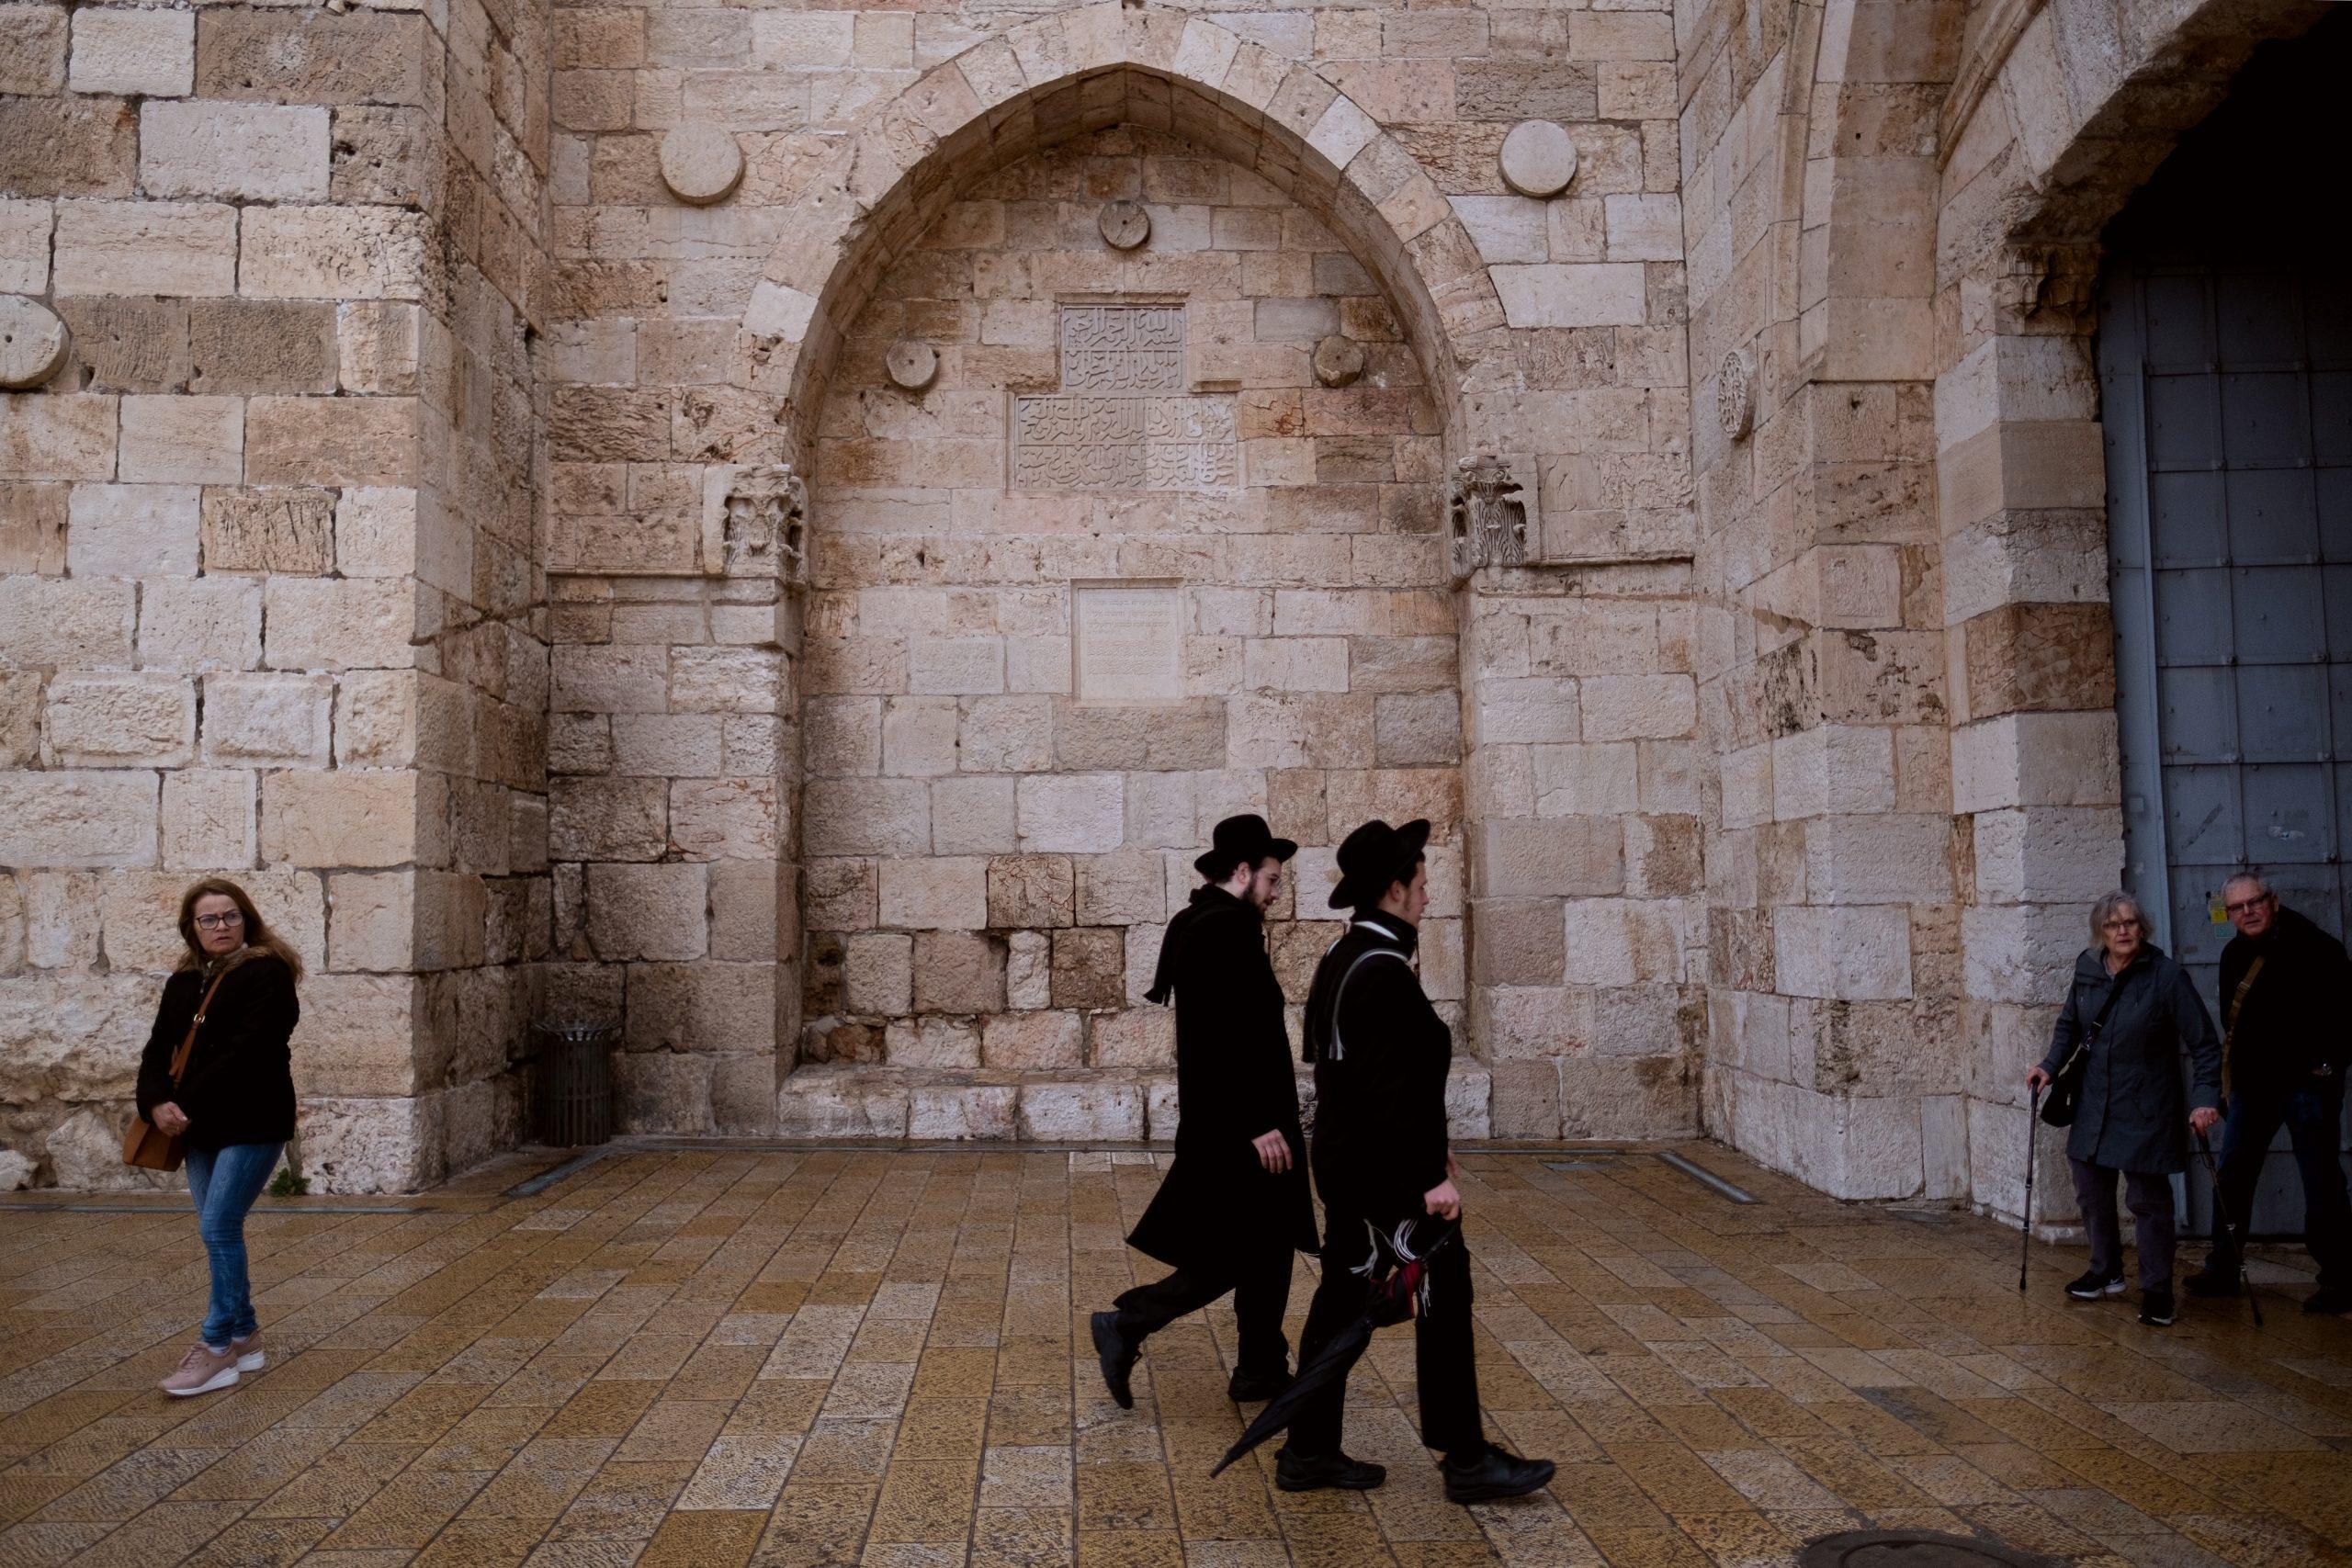 Haredim walk toward the Jaffa Gate into the Old City of Jerusalem, past a set of ancient Ottoman inscriptions.